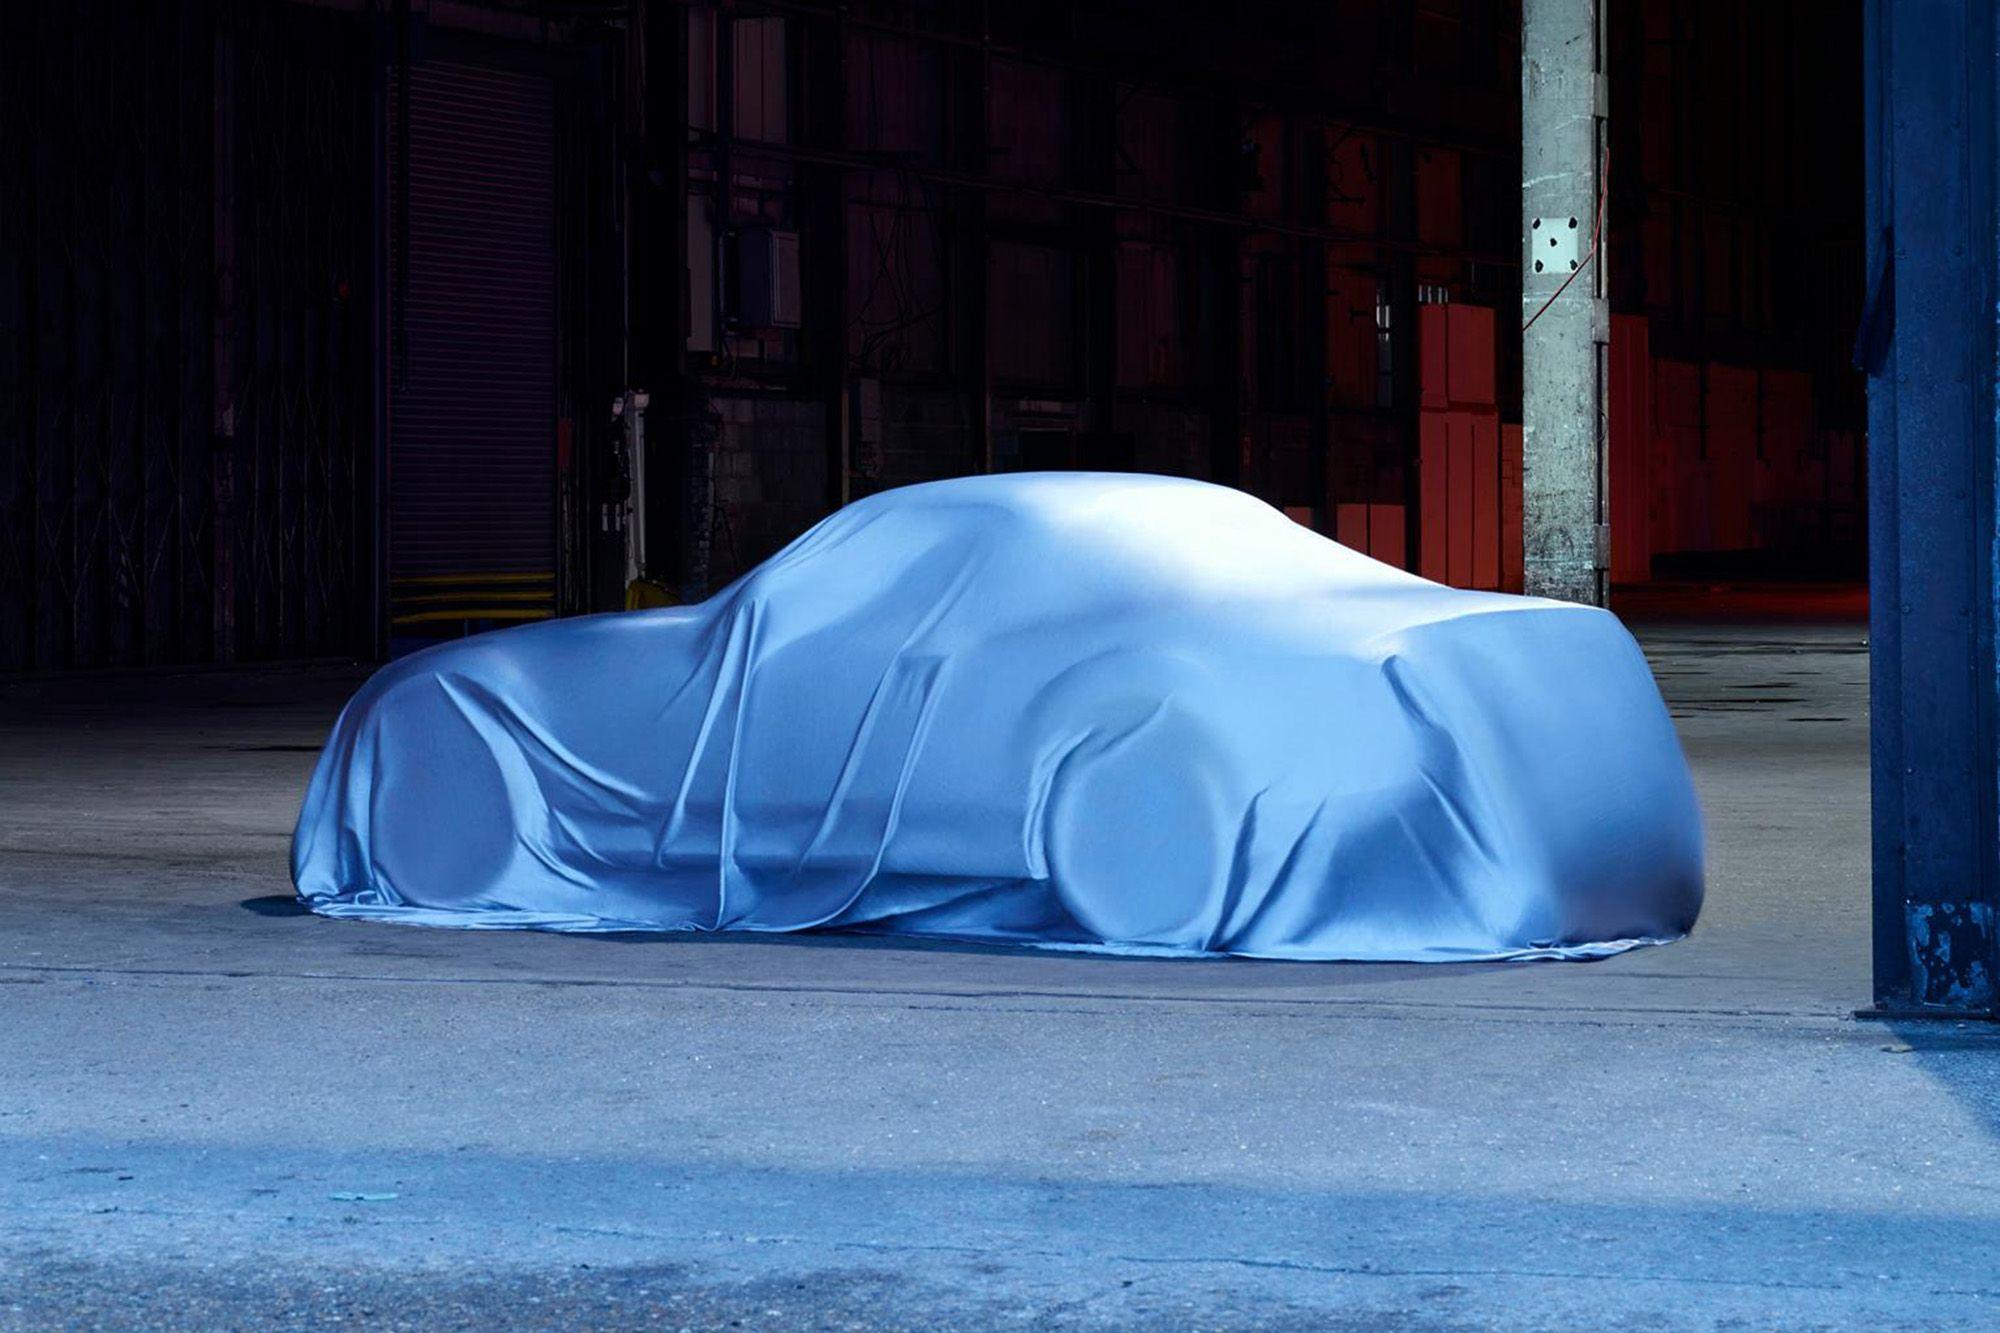 2015 Mazda MX-5 teaser photo posted onto Facebook page - http://www.caradvice.com.au/301279/2015-mazda-mx-5-teaser-photo-posted-onto-facebook-page/